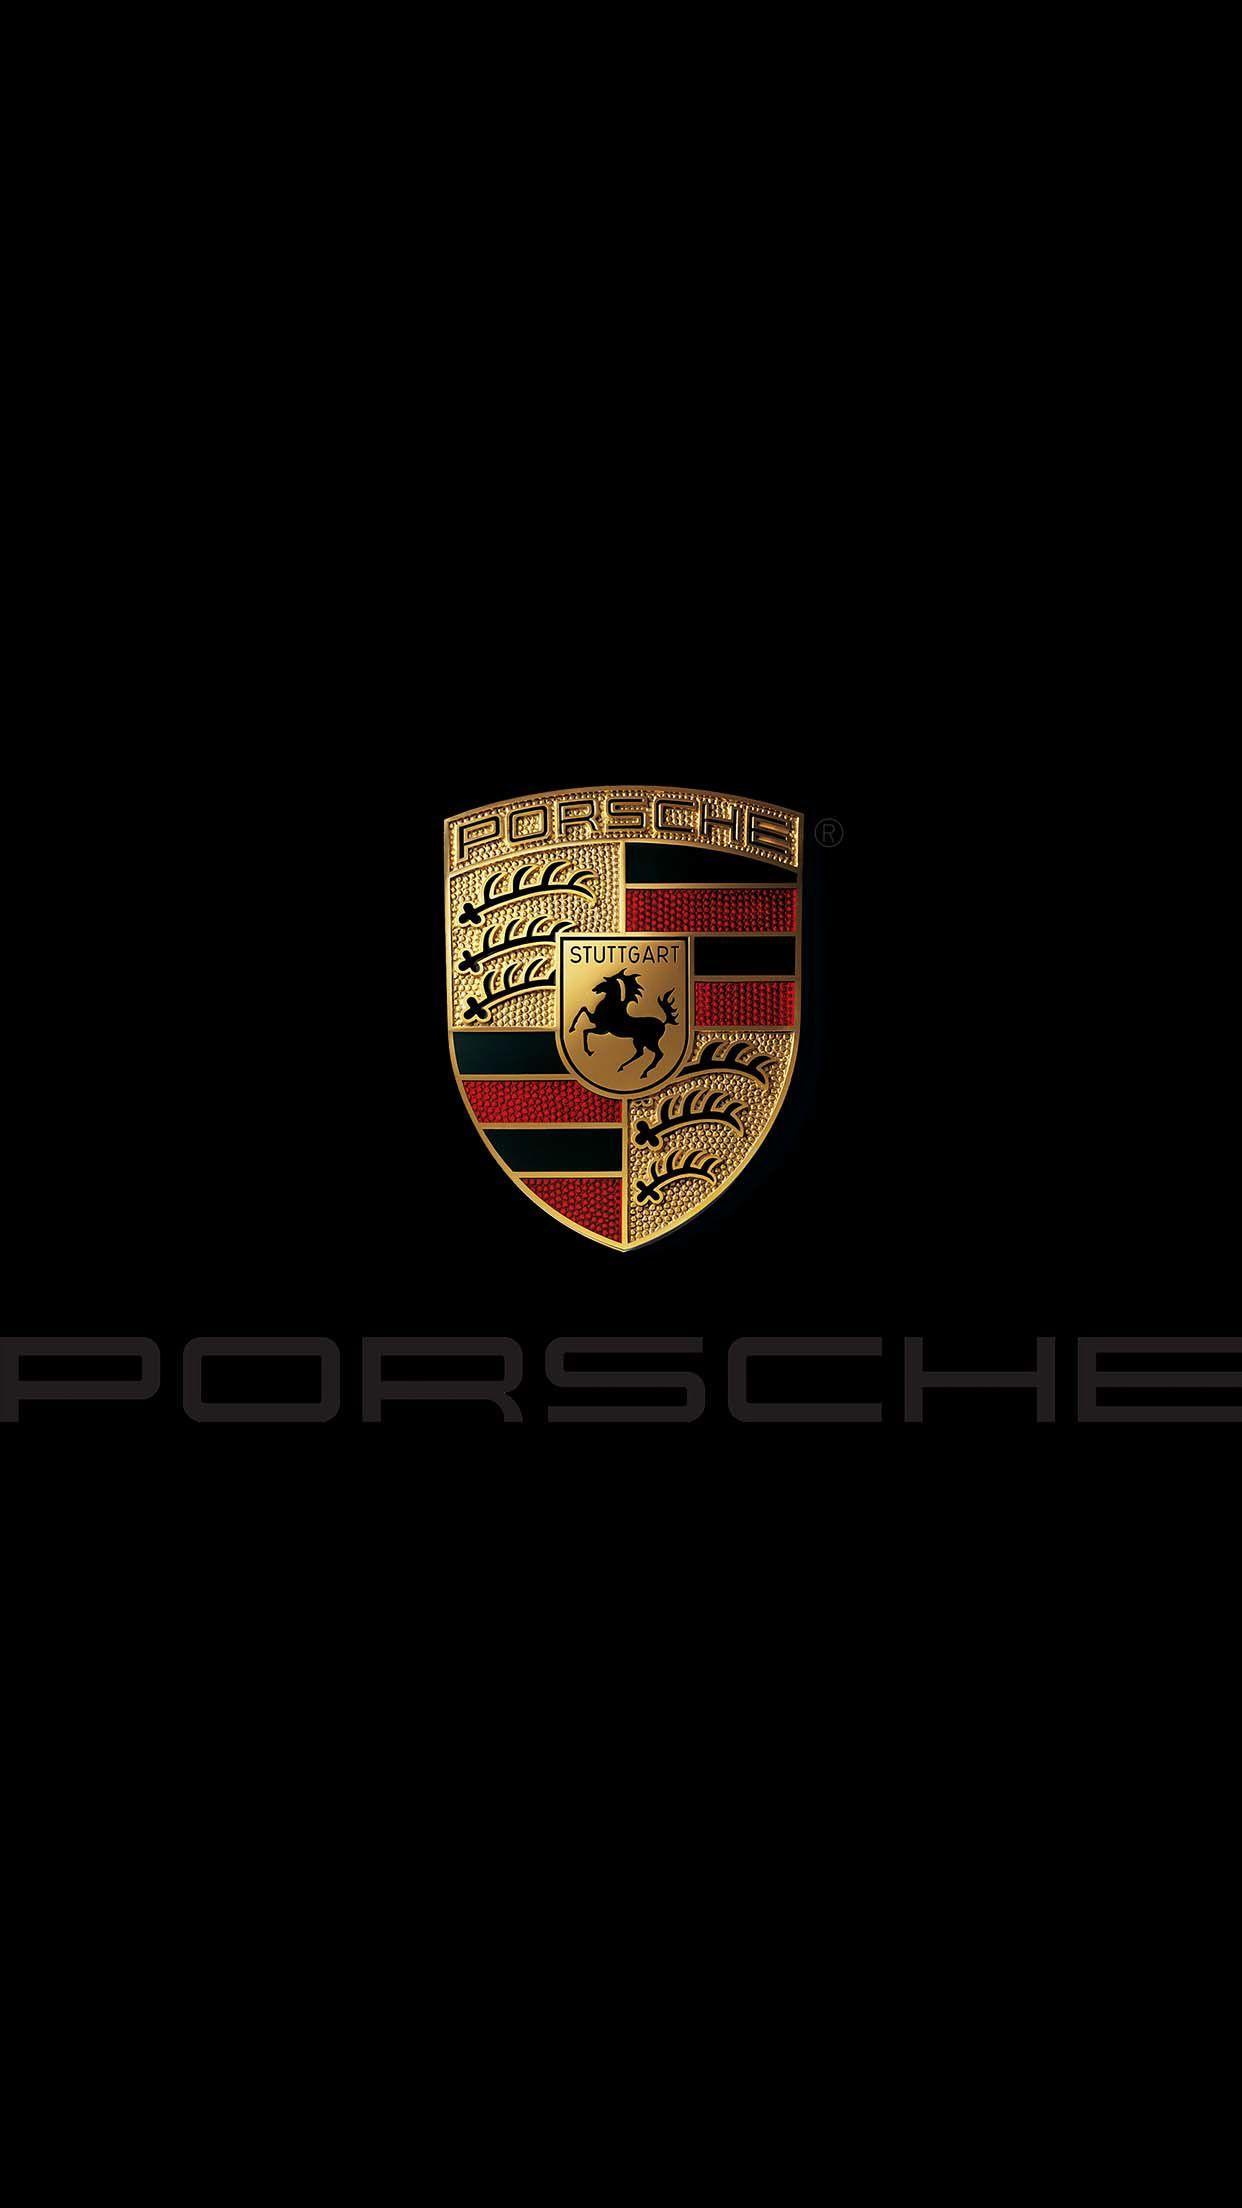 Porsche Logo Wallpapers Top Free Porsche Logo Backgrounds Wallpaperaccess